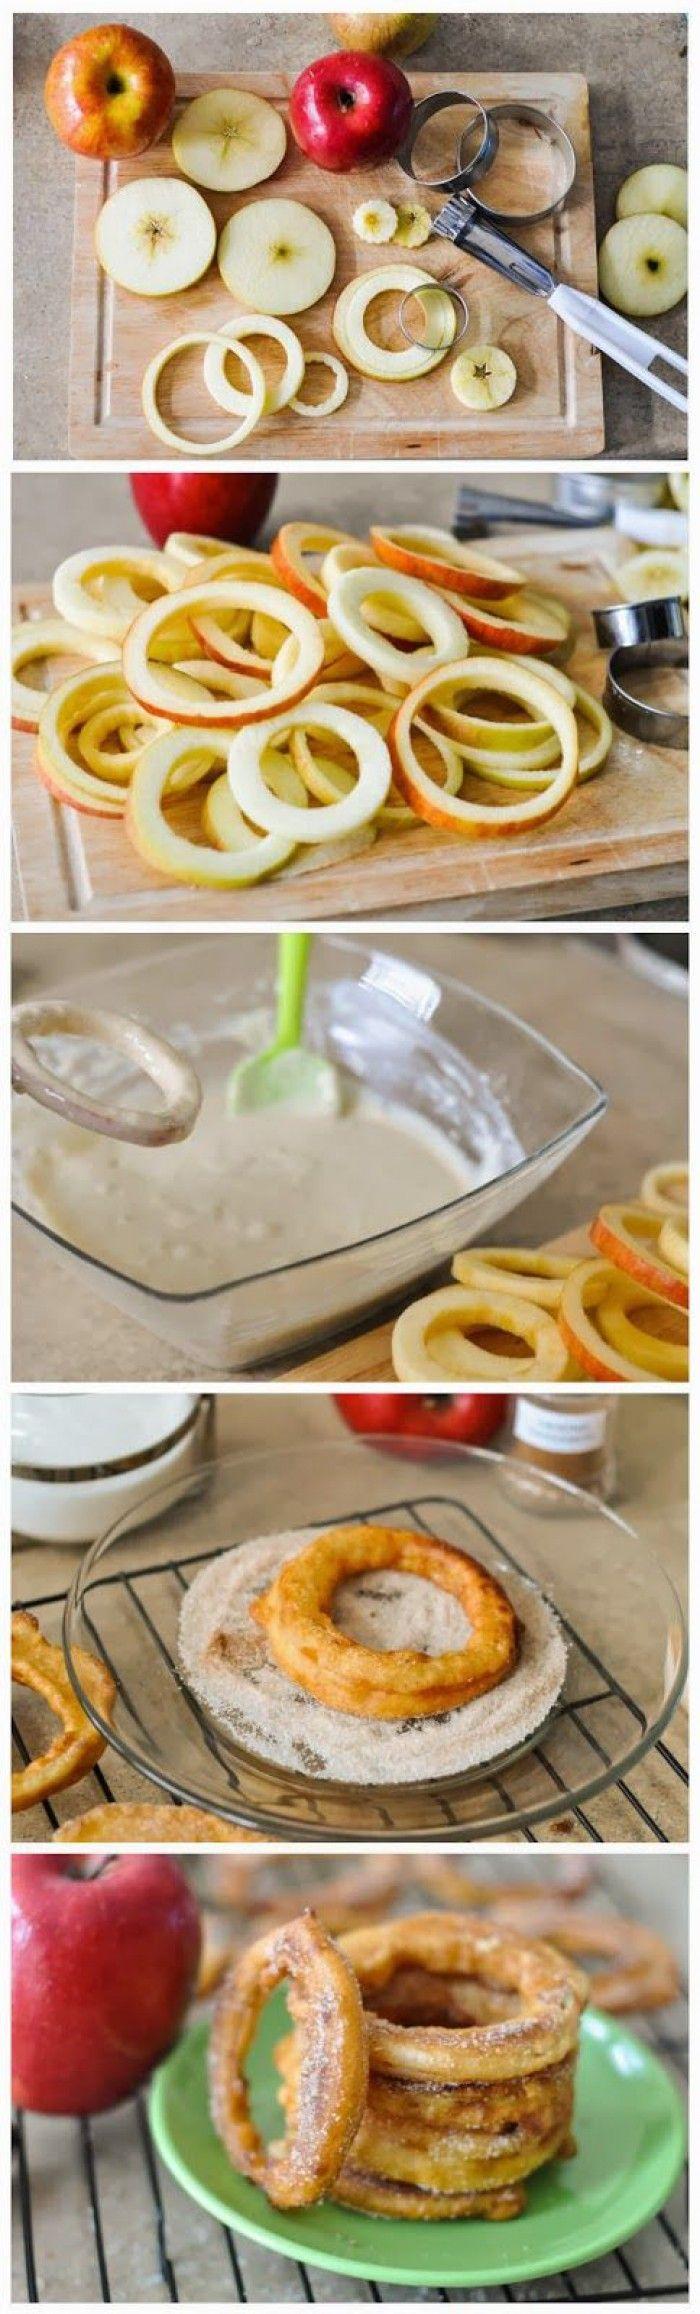 Apple Cinnamon Rings  ingrediënten: beslag  4 grote appels (ieder ras) 1 kopje bloem voor alle doeleinden 1/4 theelepel bakpoeder 2 eetlepels suiker 1/4 theelepel zout 1/8 theelepel gemalen kaneel 1 groot ei 1 kop (250 ml) karnemelk 1/2 kopje canola-olie, om te frituren  Kaneel Suiker Coating  3 eetlepels suiker 1 theelepel gemalen kaneel